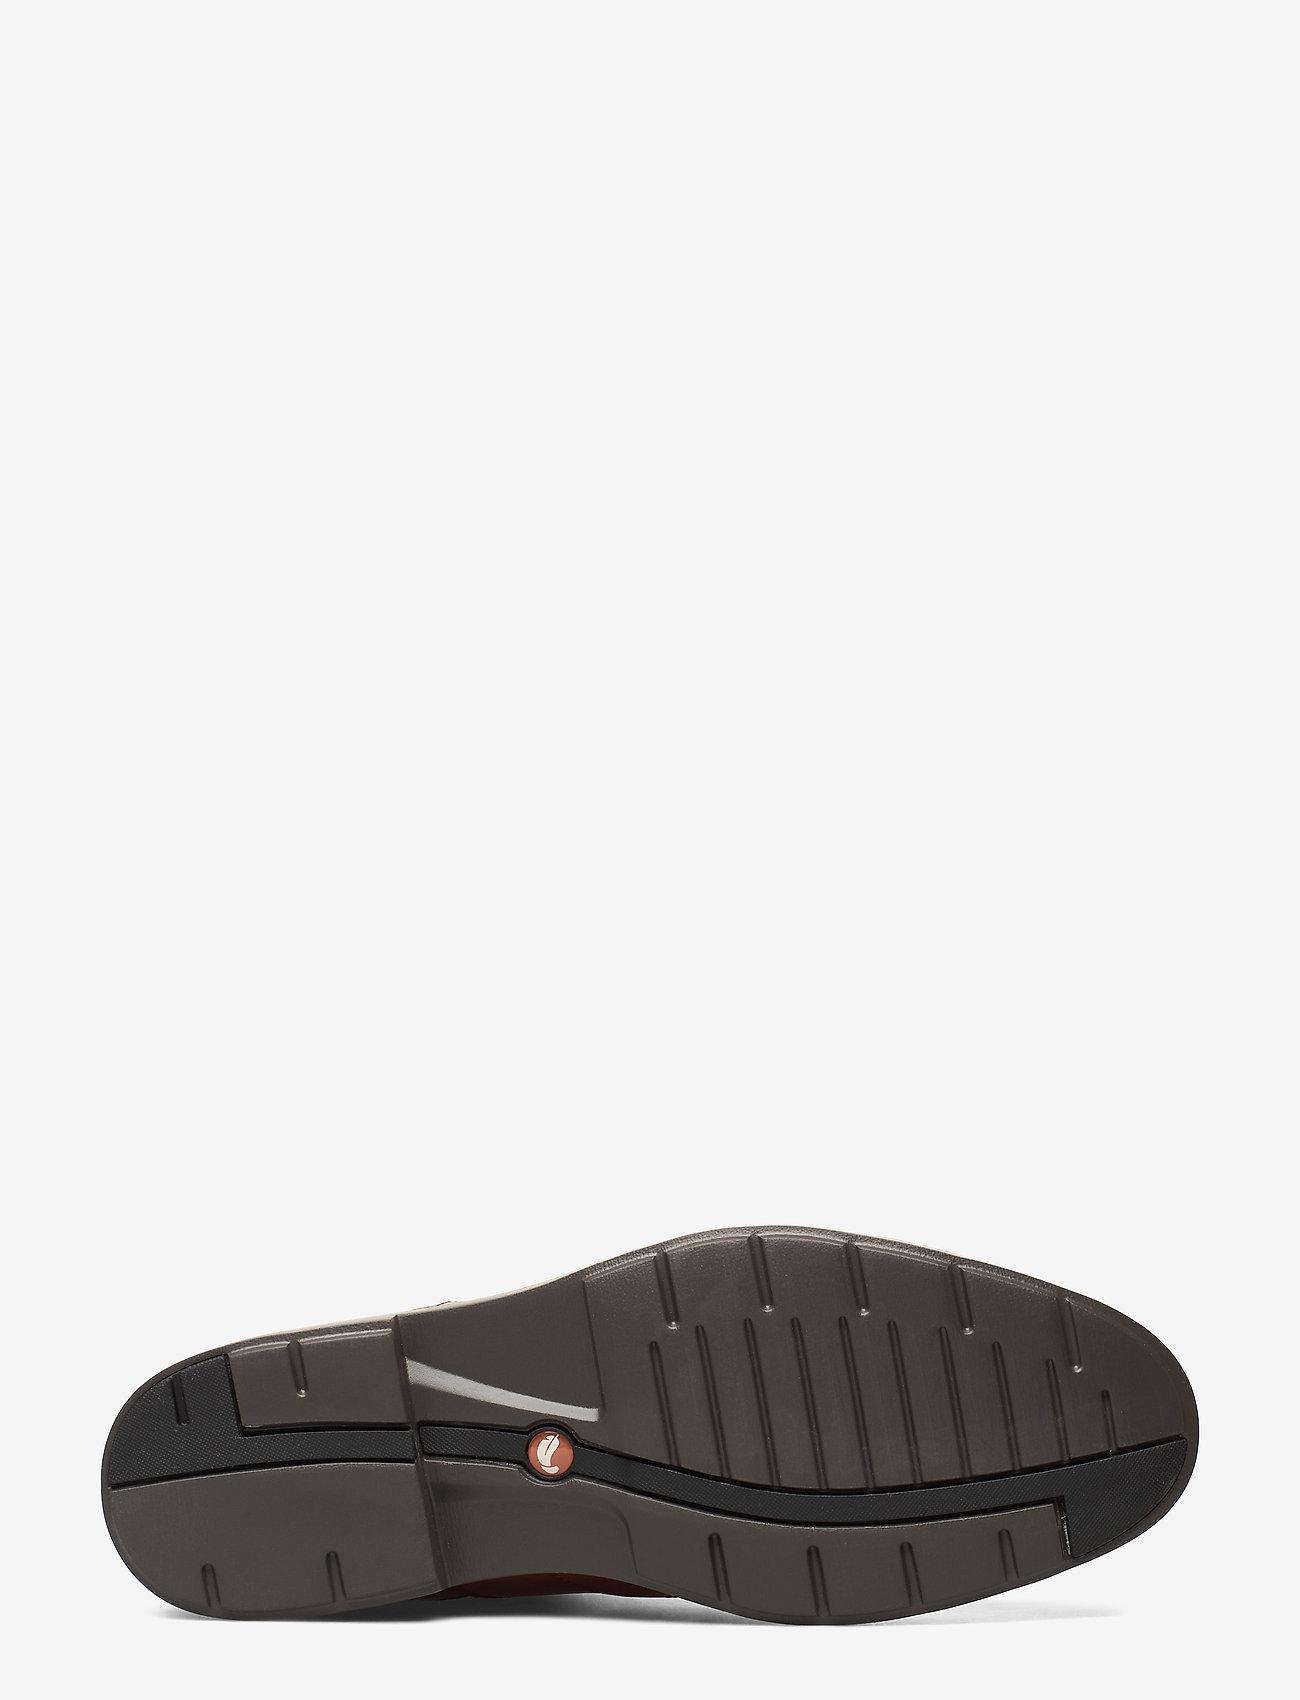 Un Tailor Wing (Tan Leather) - Clarks